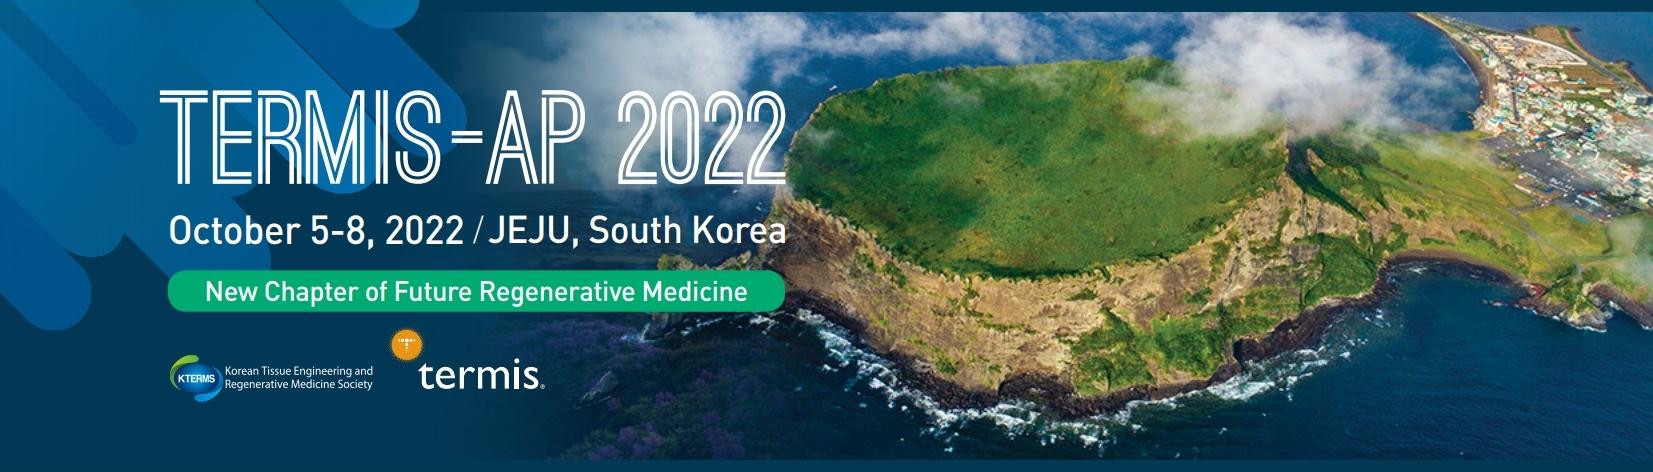 TERMIS - AP Chapter 2022 Conference - JEJU, South Korea